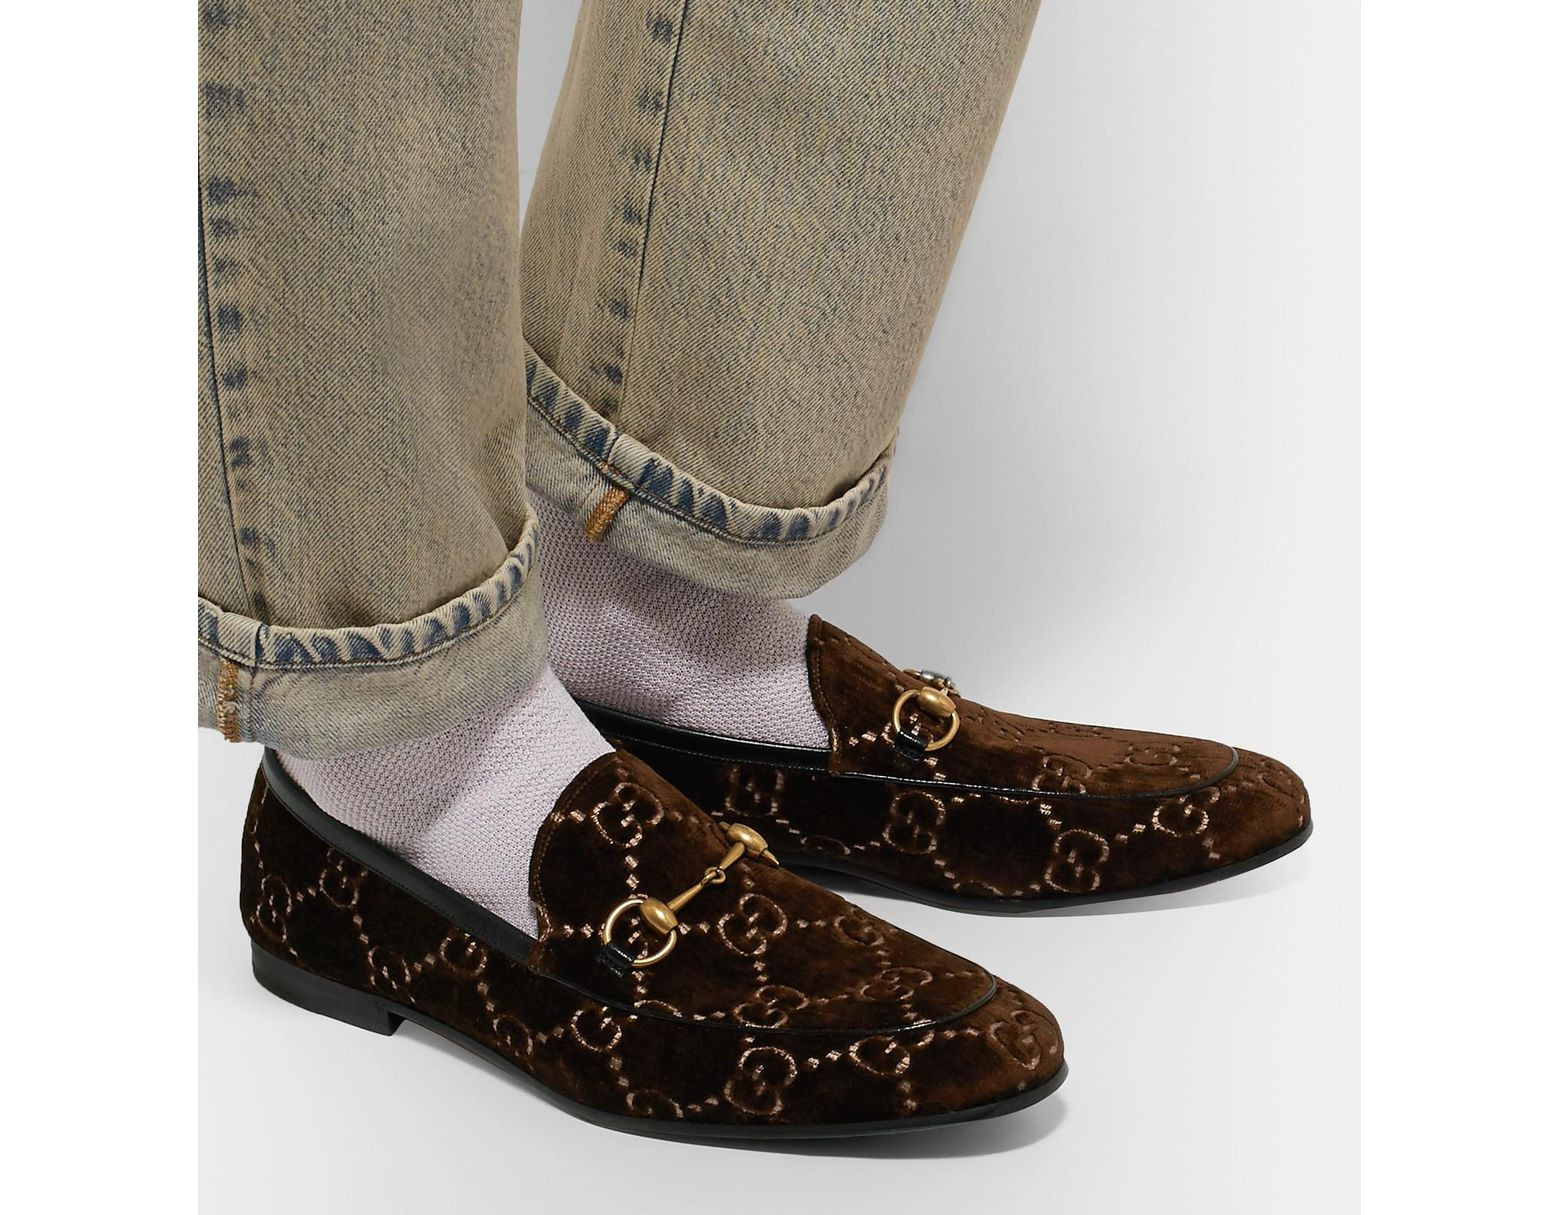 28780e8e2 Gucci Brown GG Jordan Velvet Loafers in Brown for Men - Save 35% - Lyst